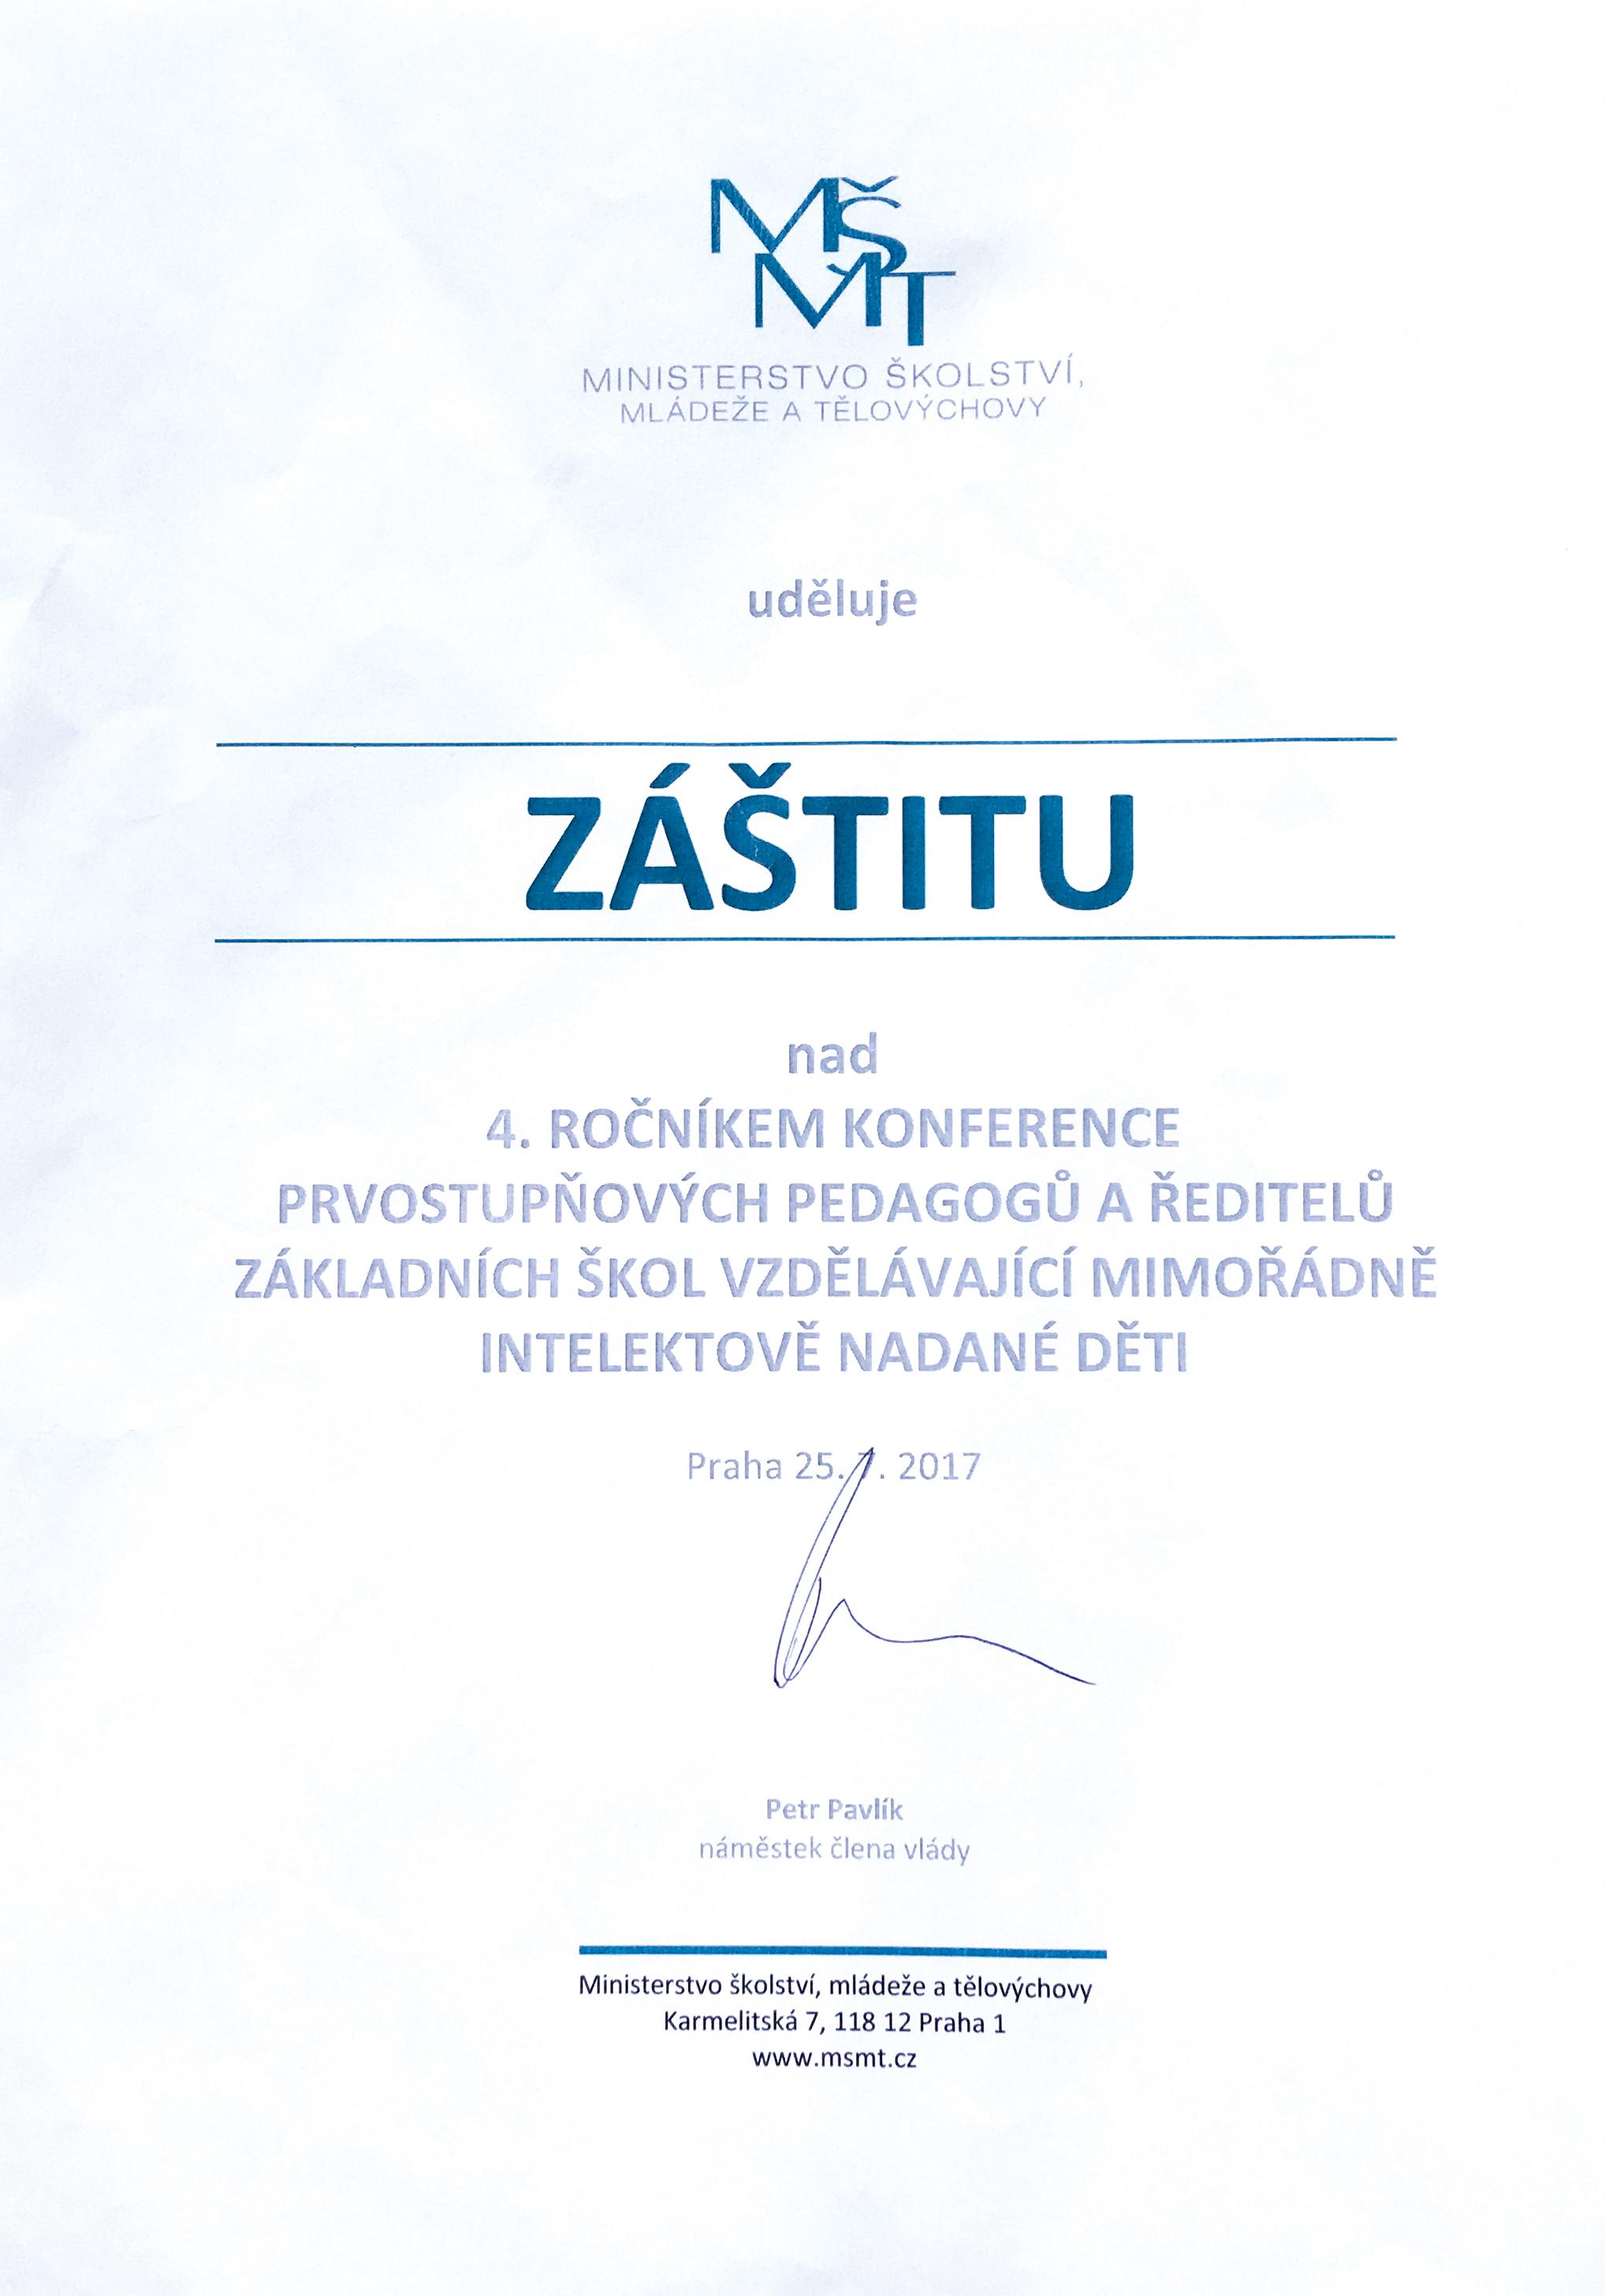 Zastita-Konference-1